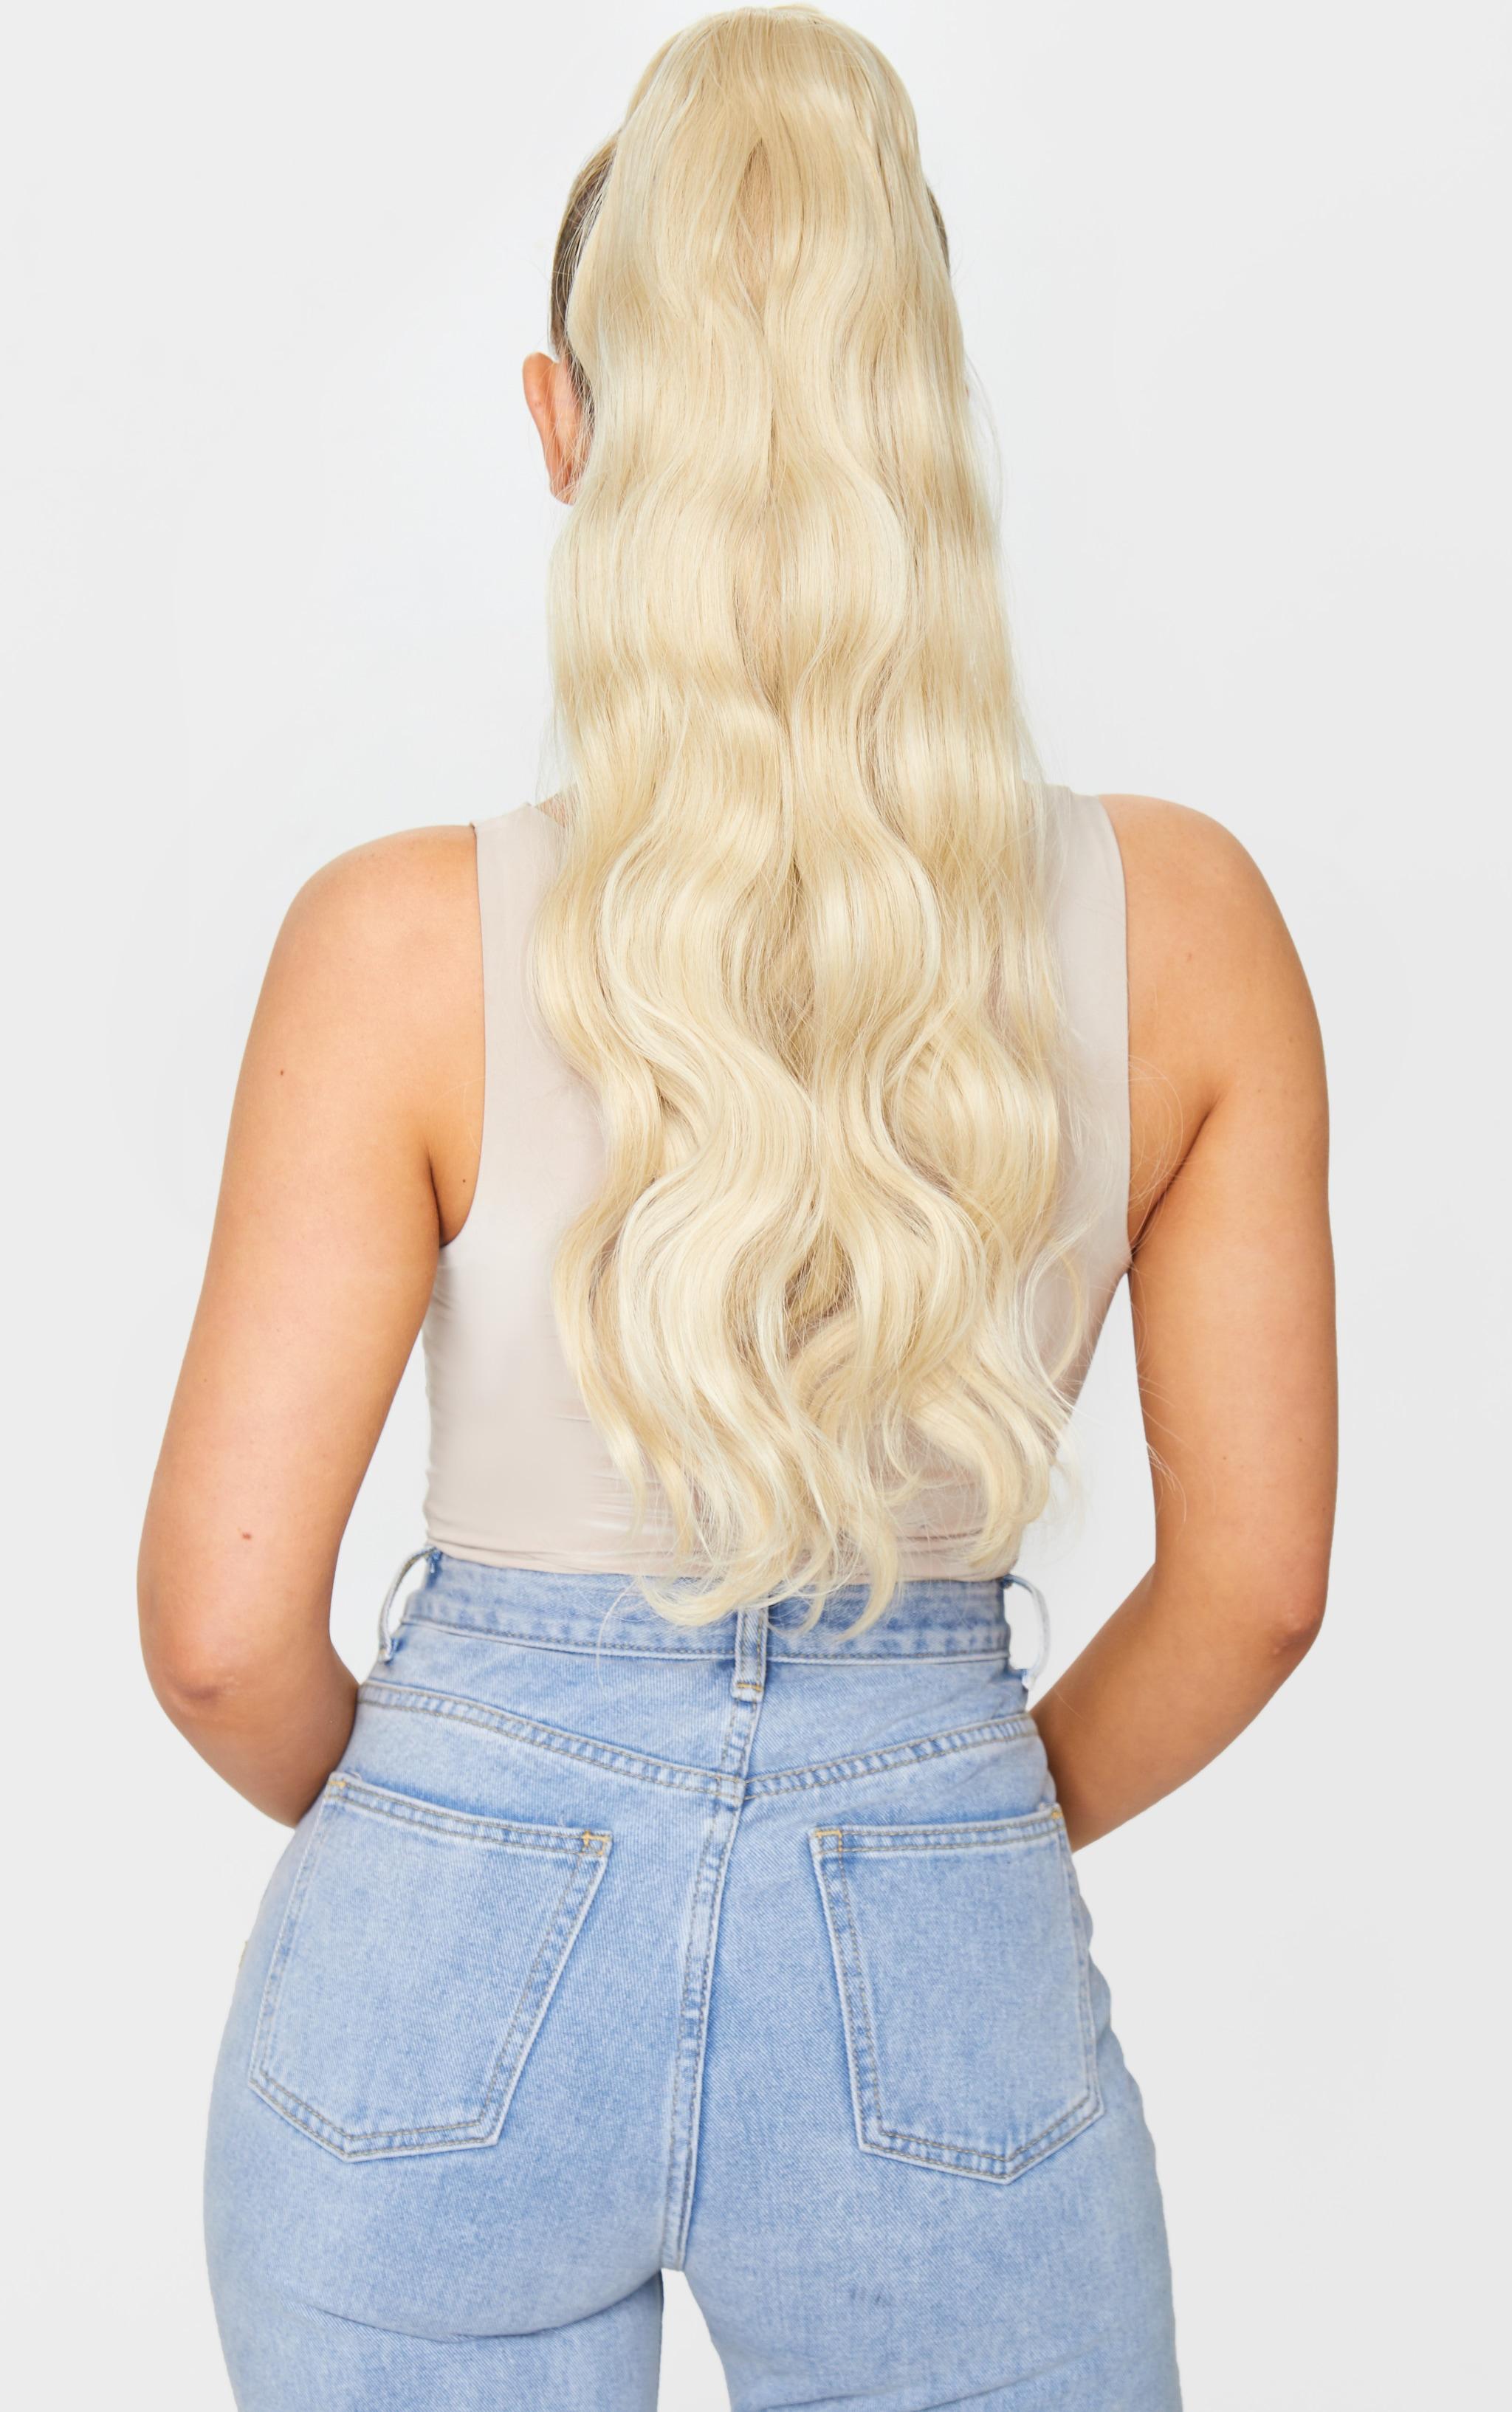 LullaBellz Grande Hollywood Wave 26 Wraparound Pony Light Blonde 3